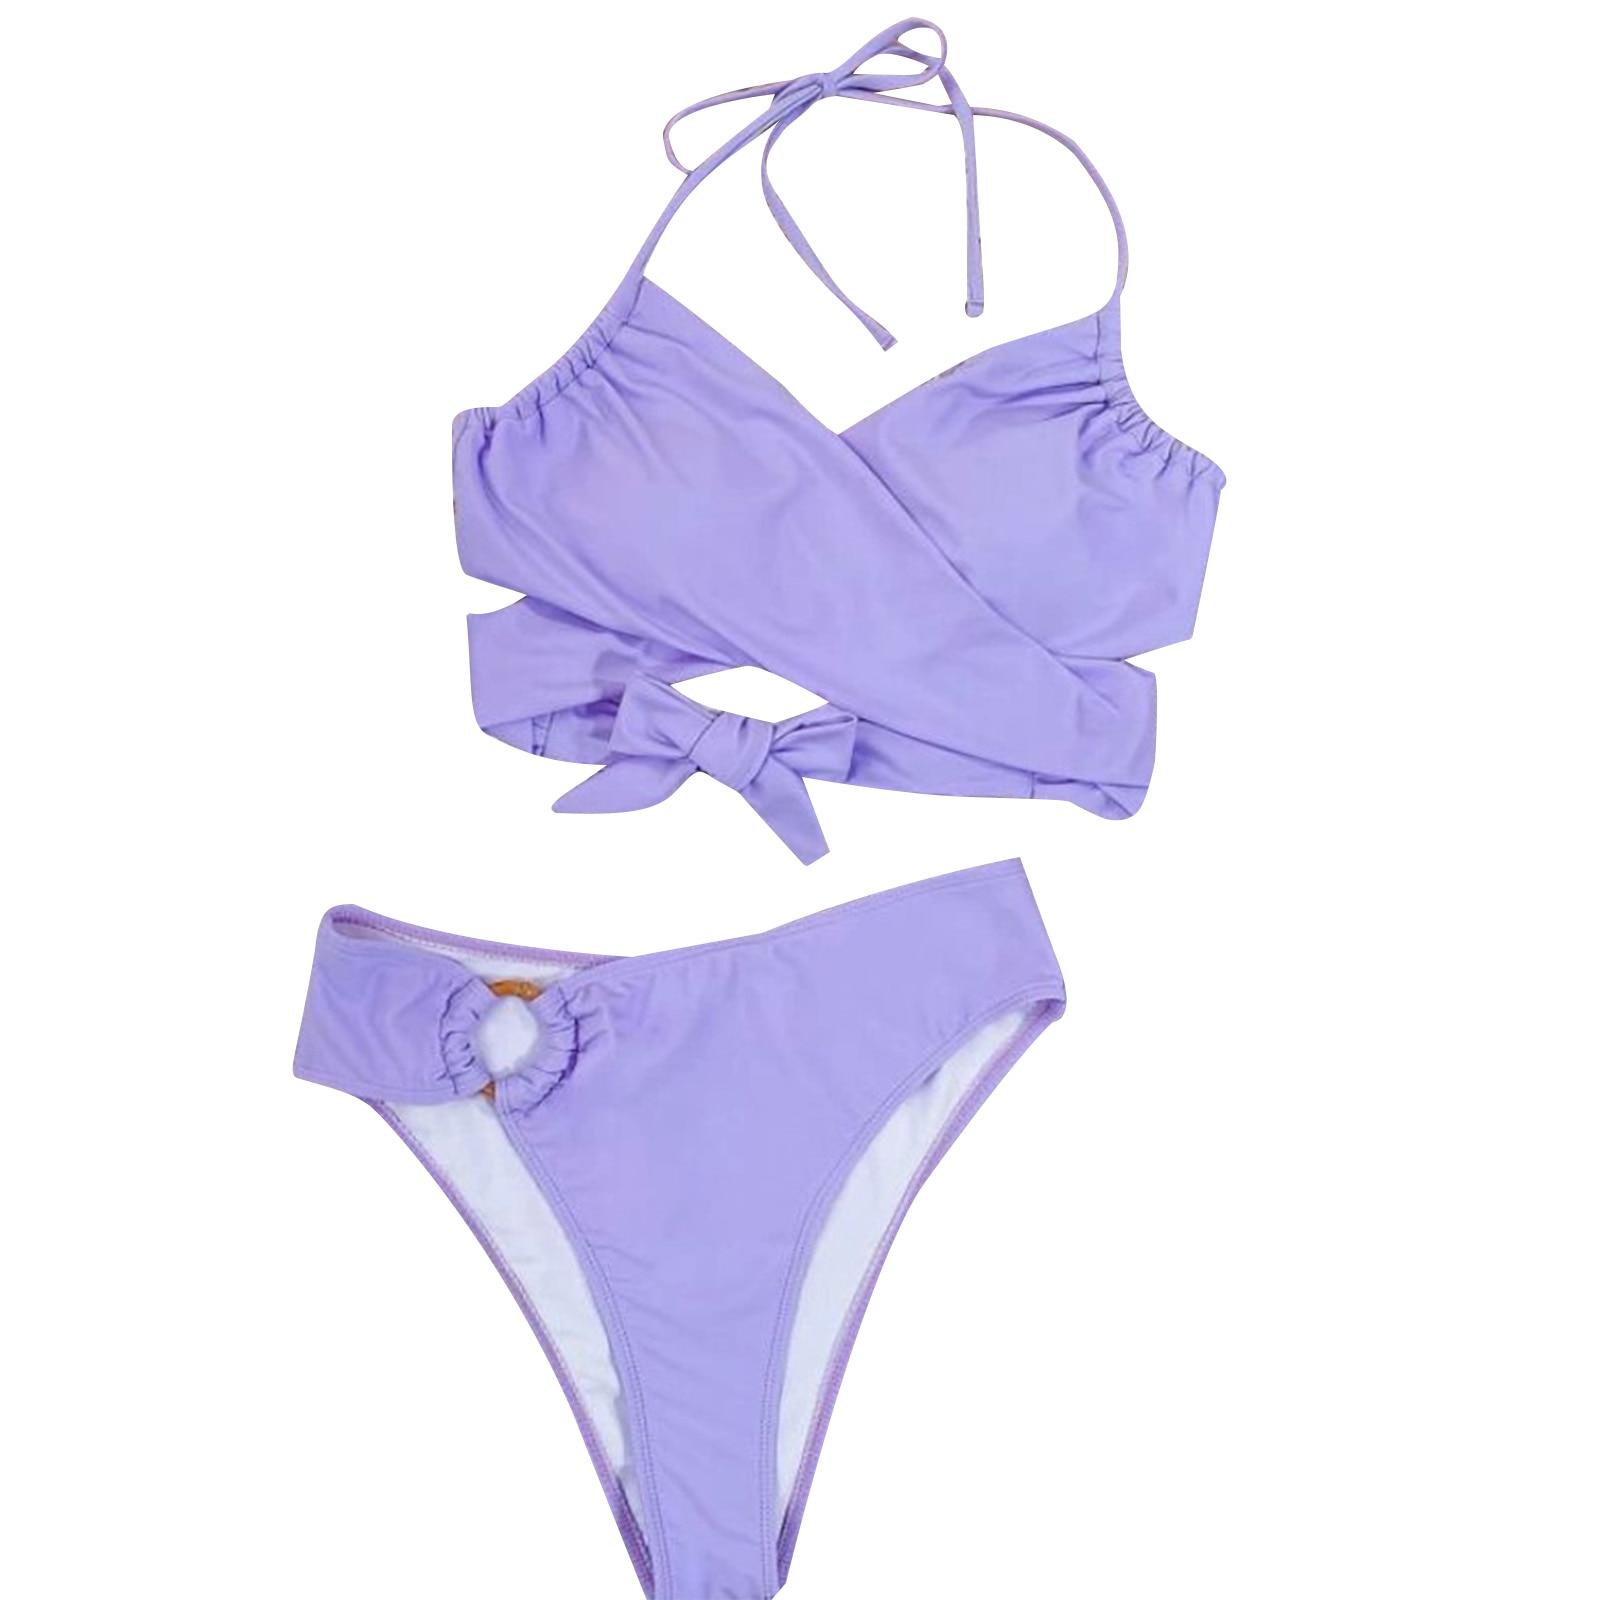 Women Female Two-Piece Swimsuits Womens Solid Color Bikini Top+ High Waist Panties Purple S/M/L 2